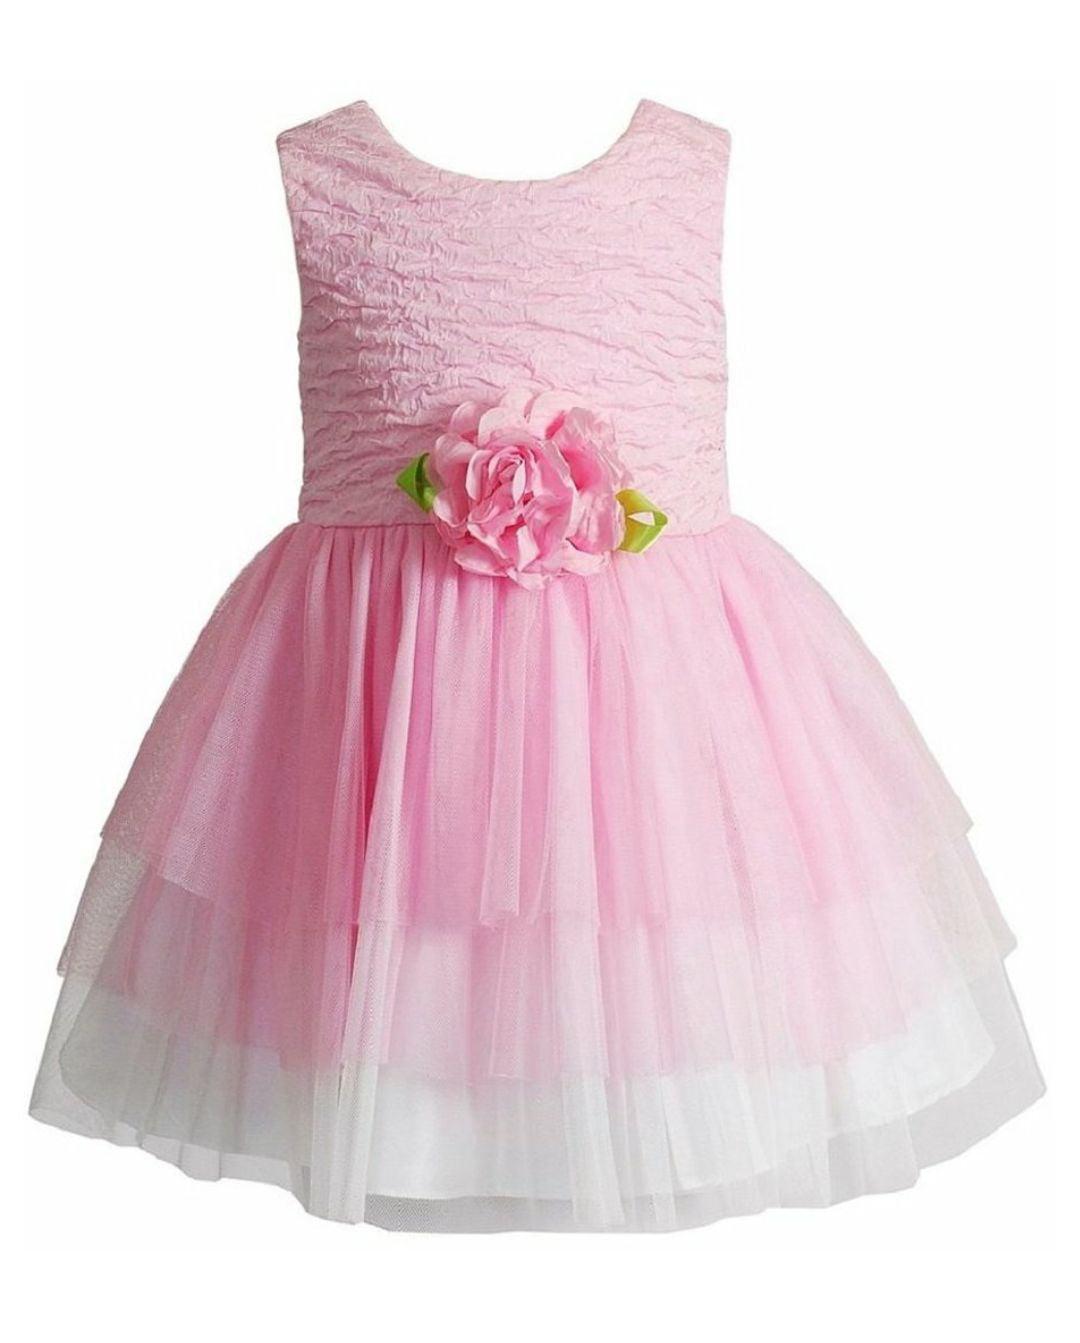 Youngland Toddler Girls Sleeveless Pink Easter Ballerina Tutu Dress